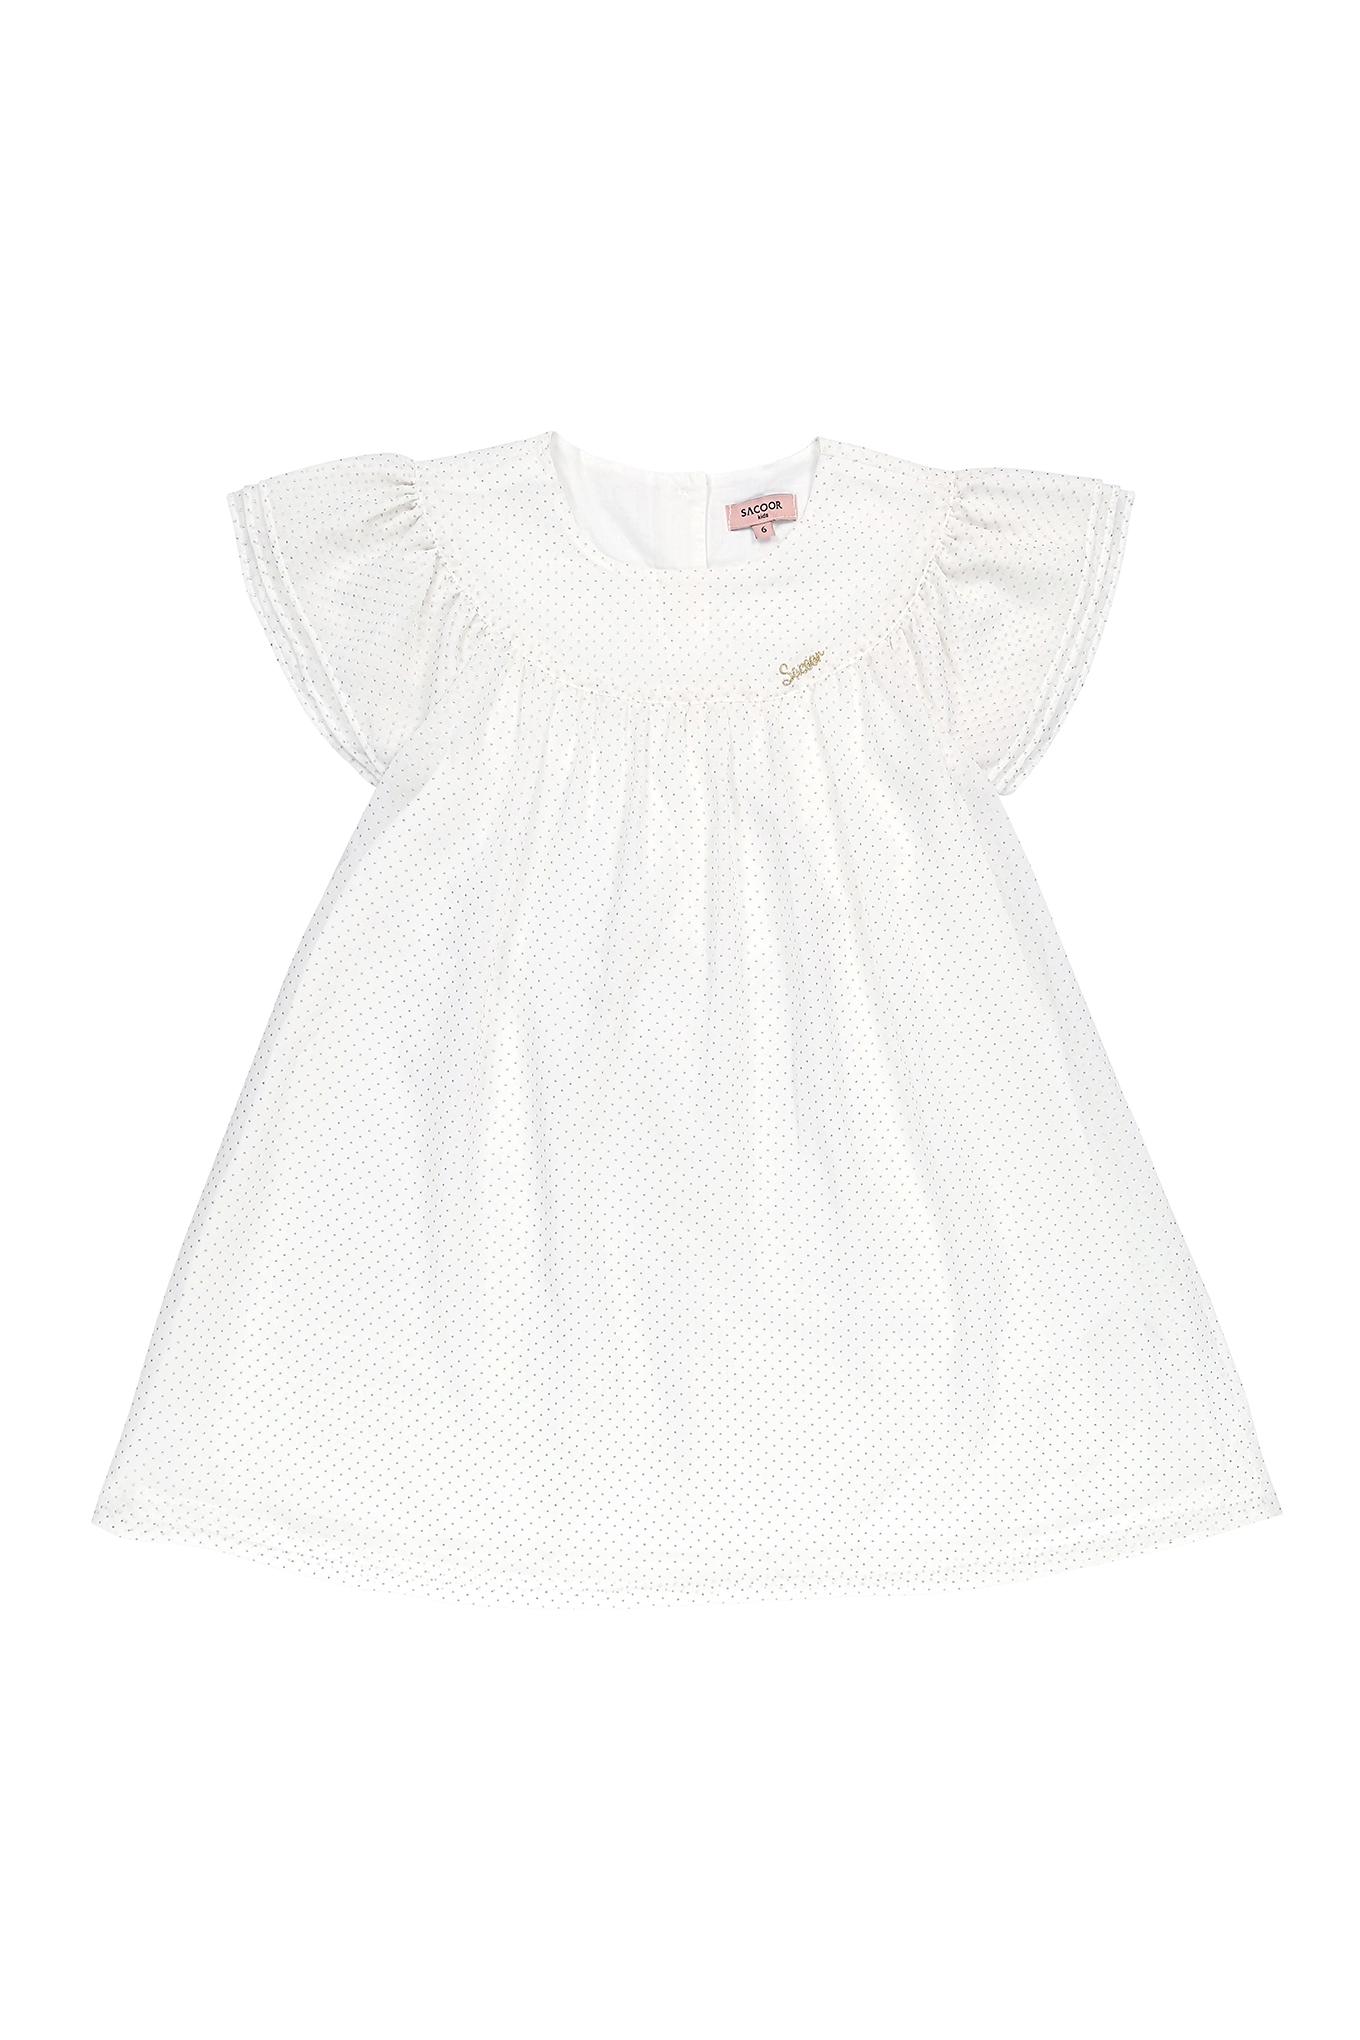 Dress White Casual Girl